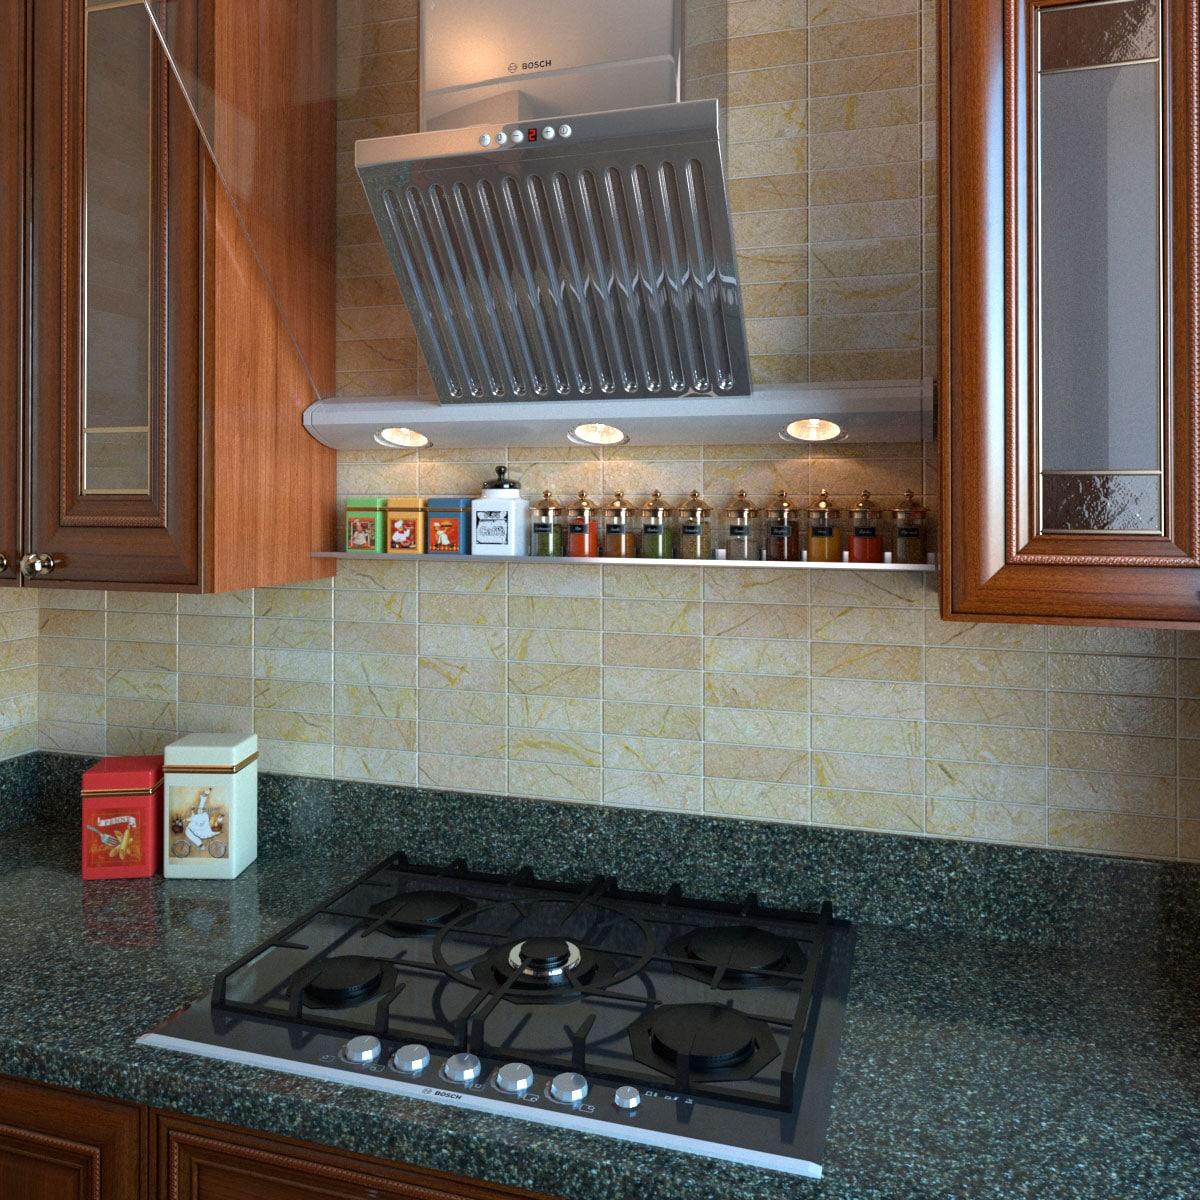 Kitchen Shelf Above Stove: Stainless Steel Floating Shelves Kitchen